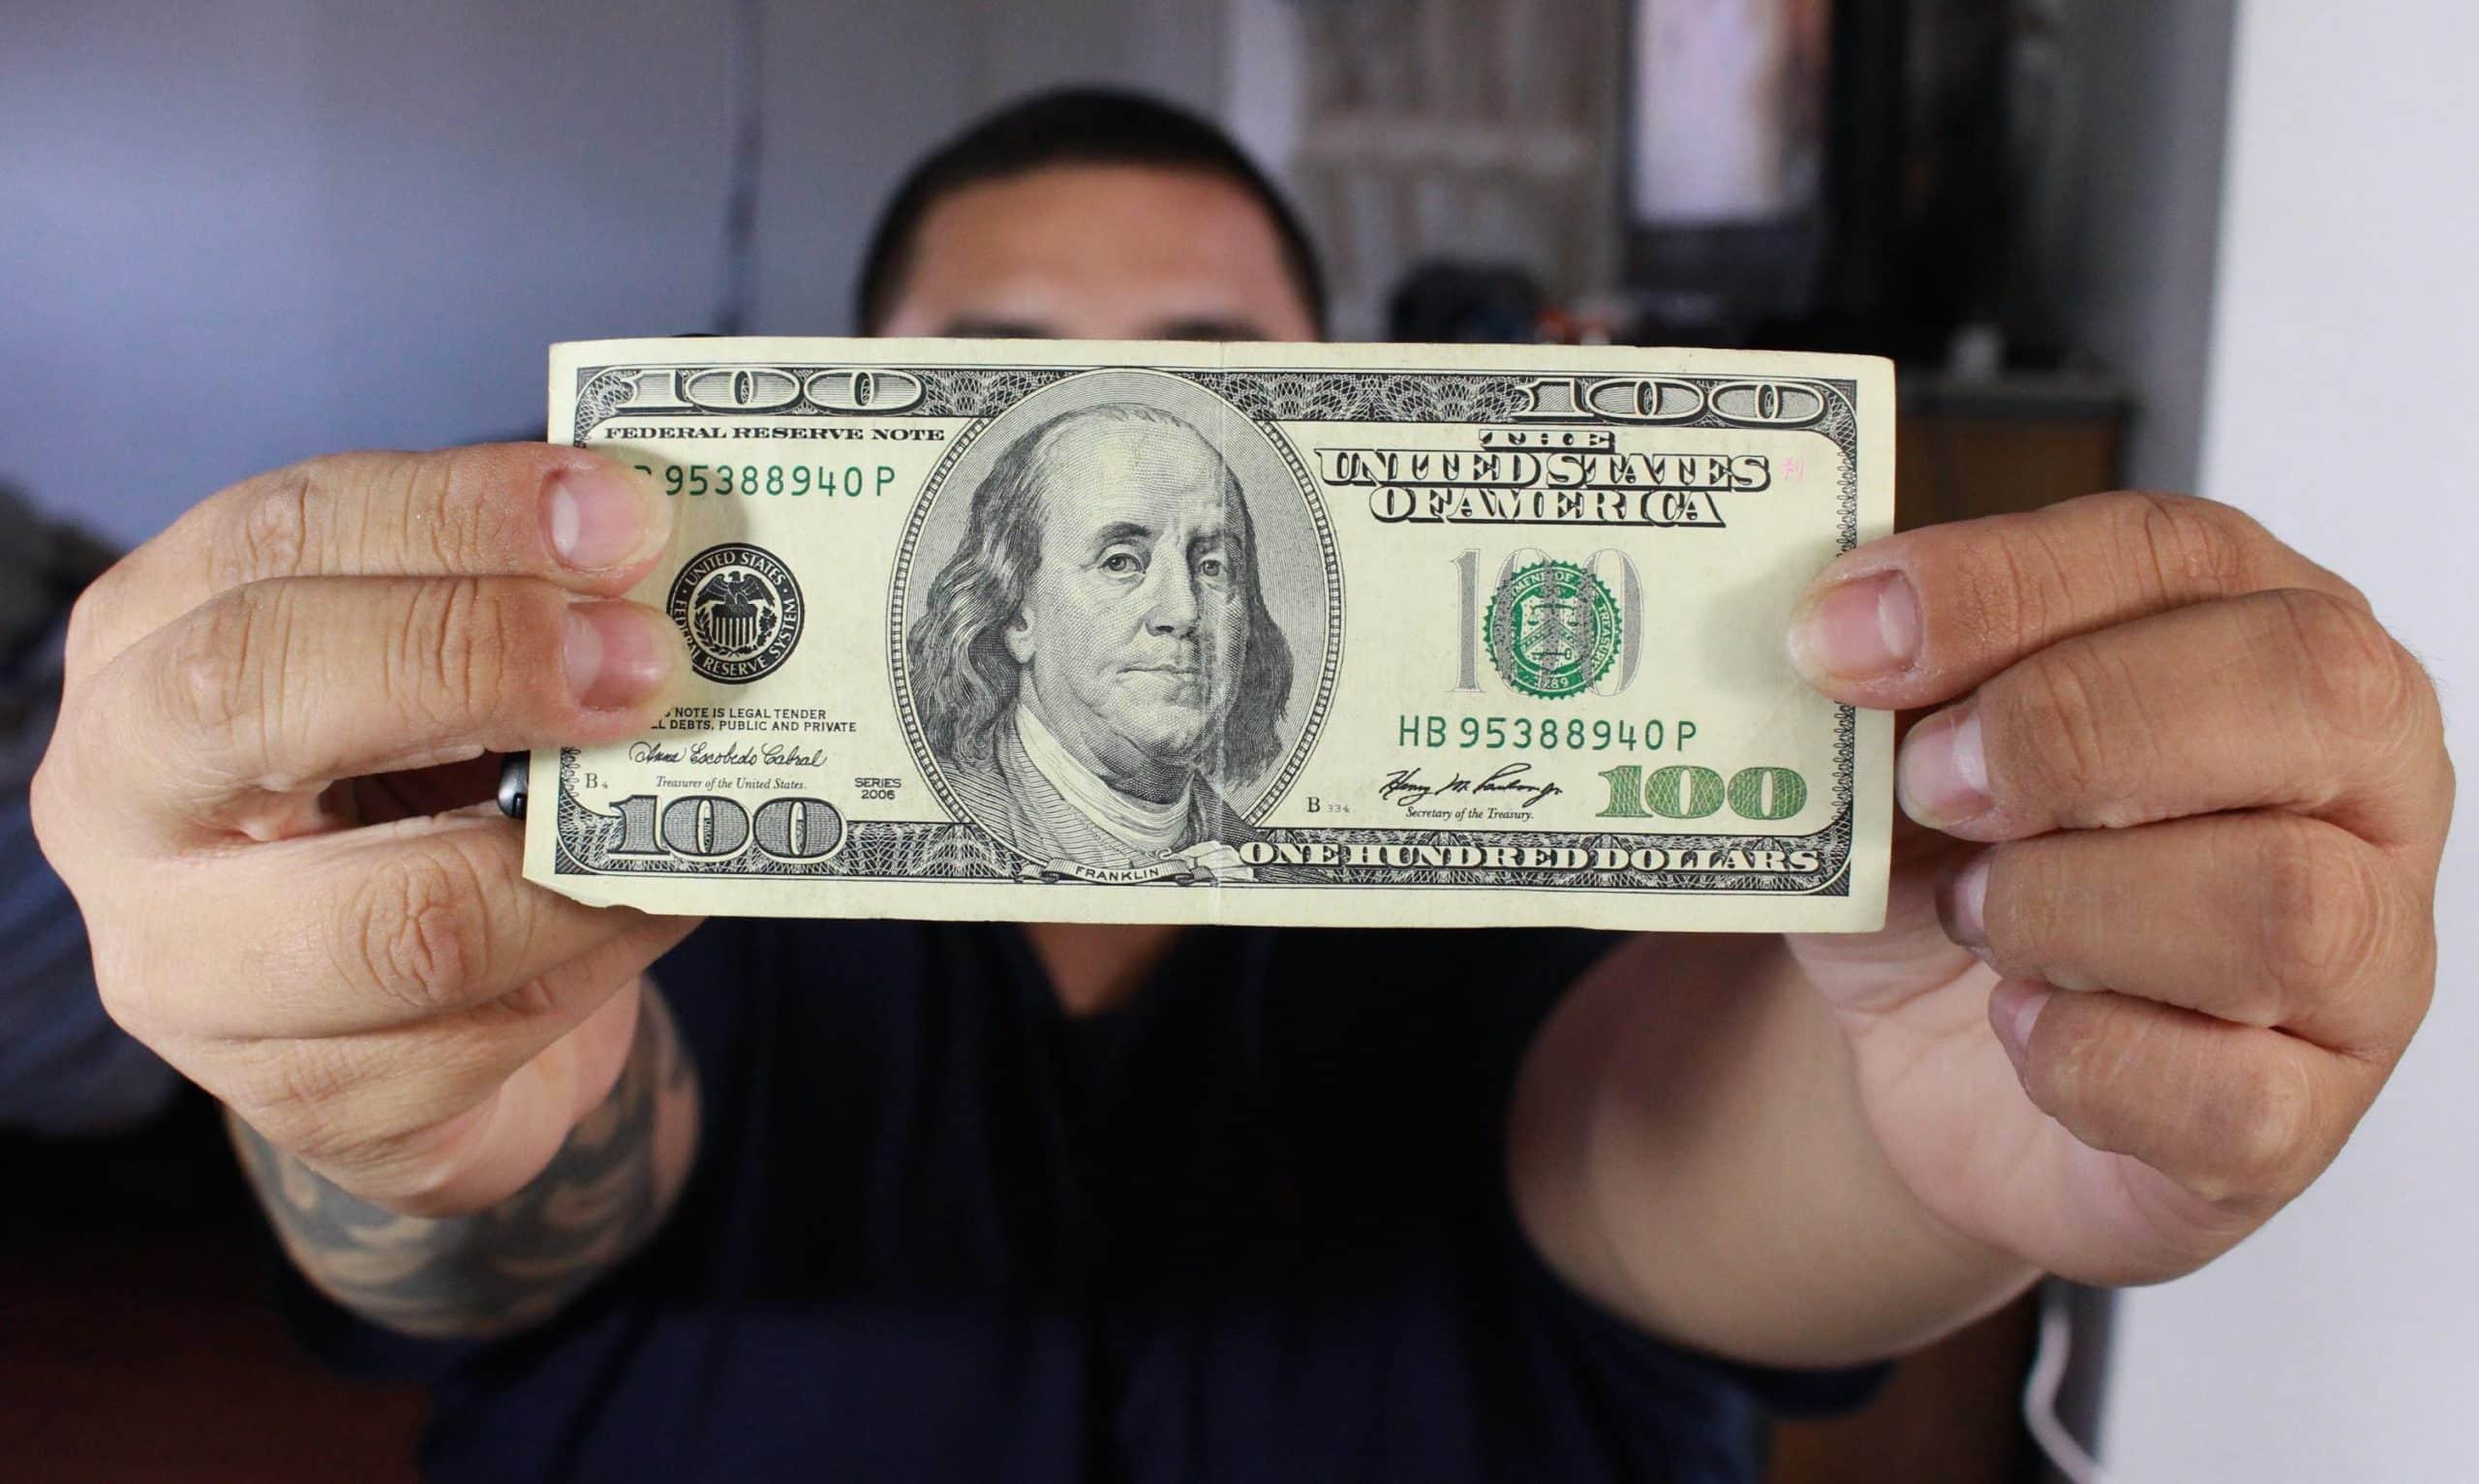 Make $100 Fast